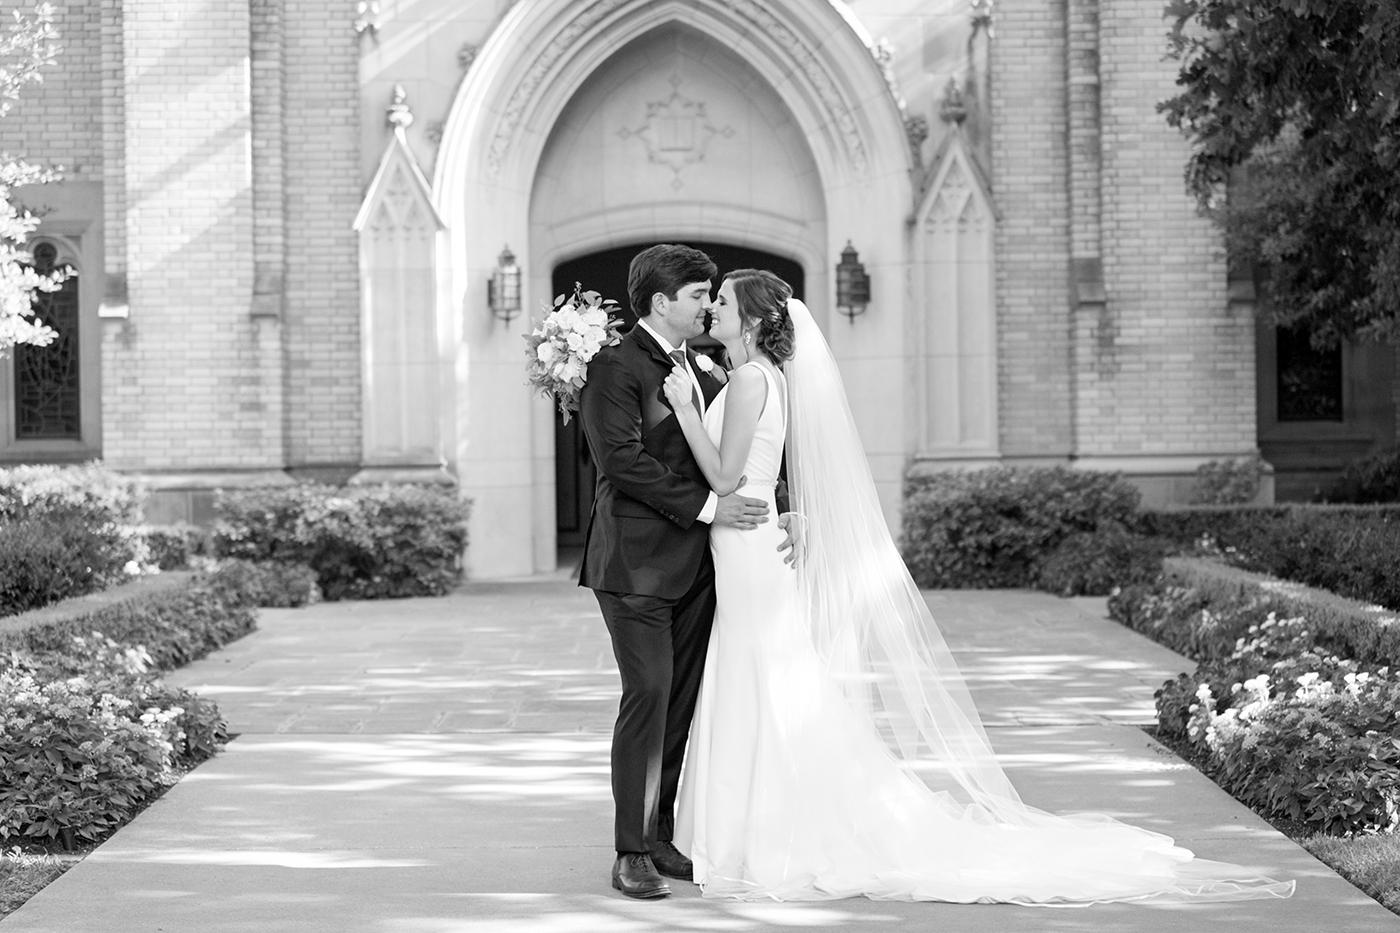 Wedding Planner Dallas TX - Allday Events - Highland Park - Marie Gabrielle Wedding - 266.jpg